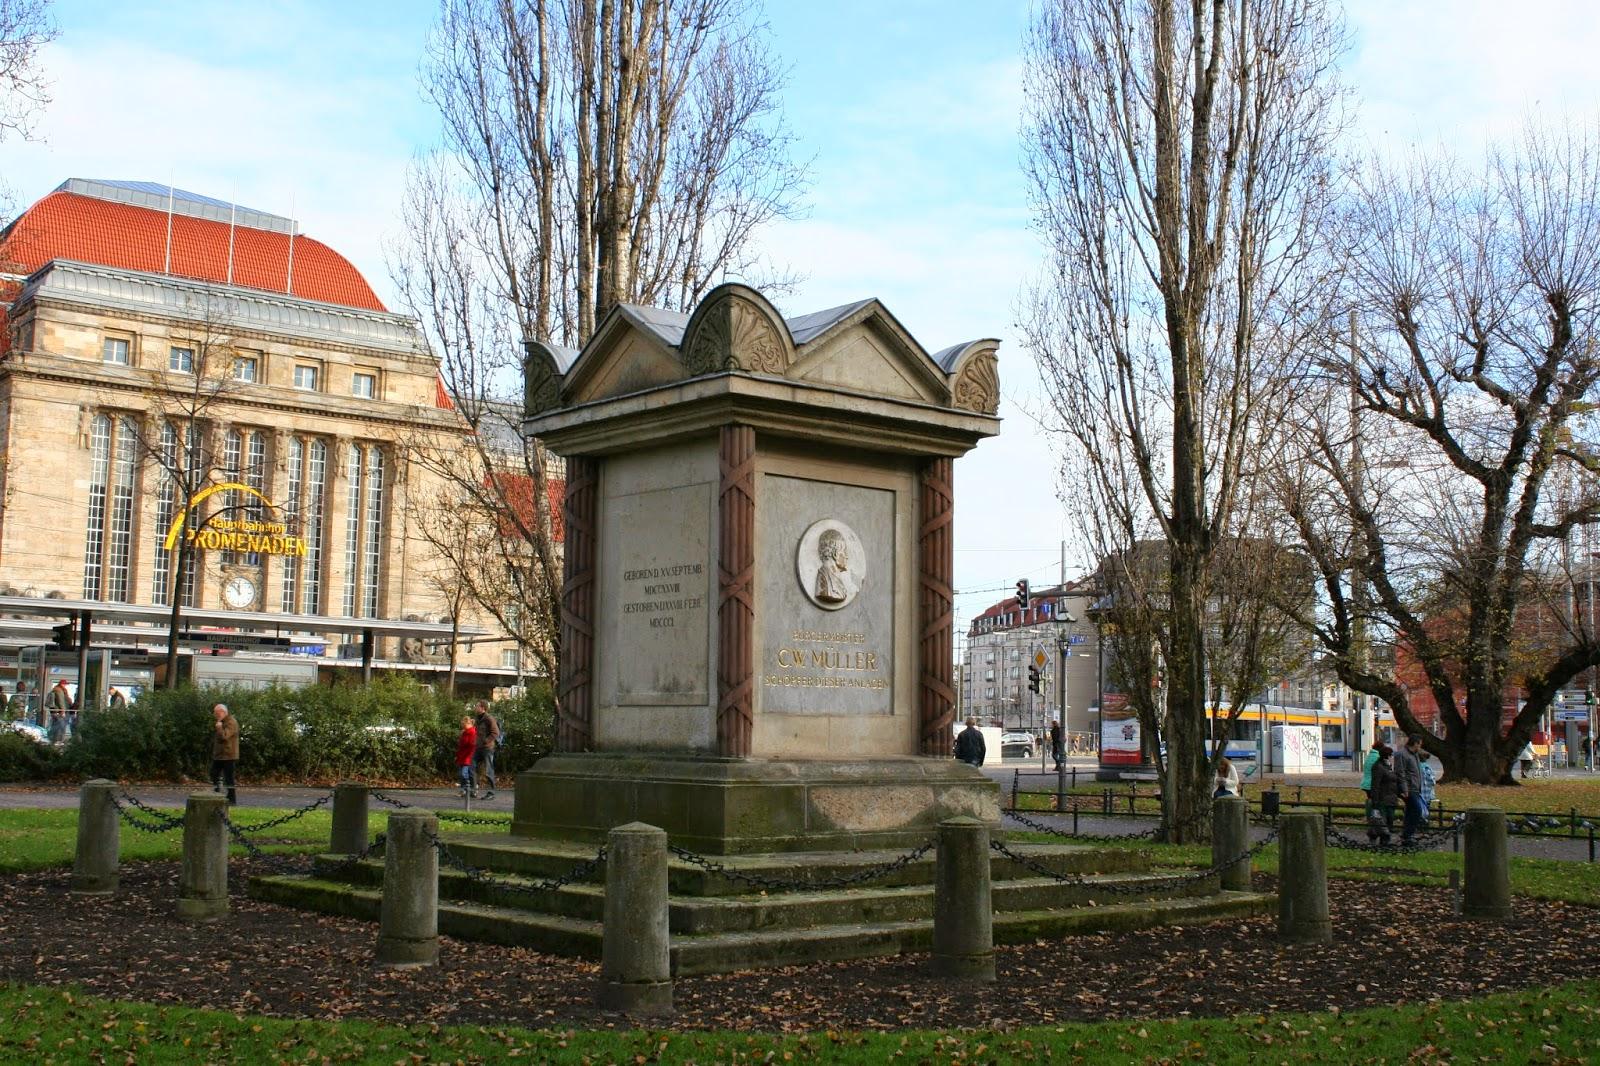 Carl Wilhelm Müller Denkmal gegenüber dem Hauptbahnhof